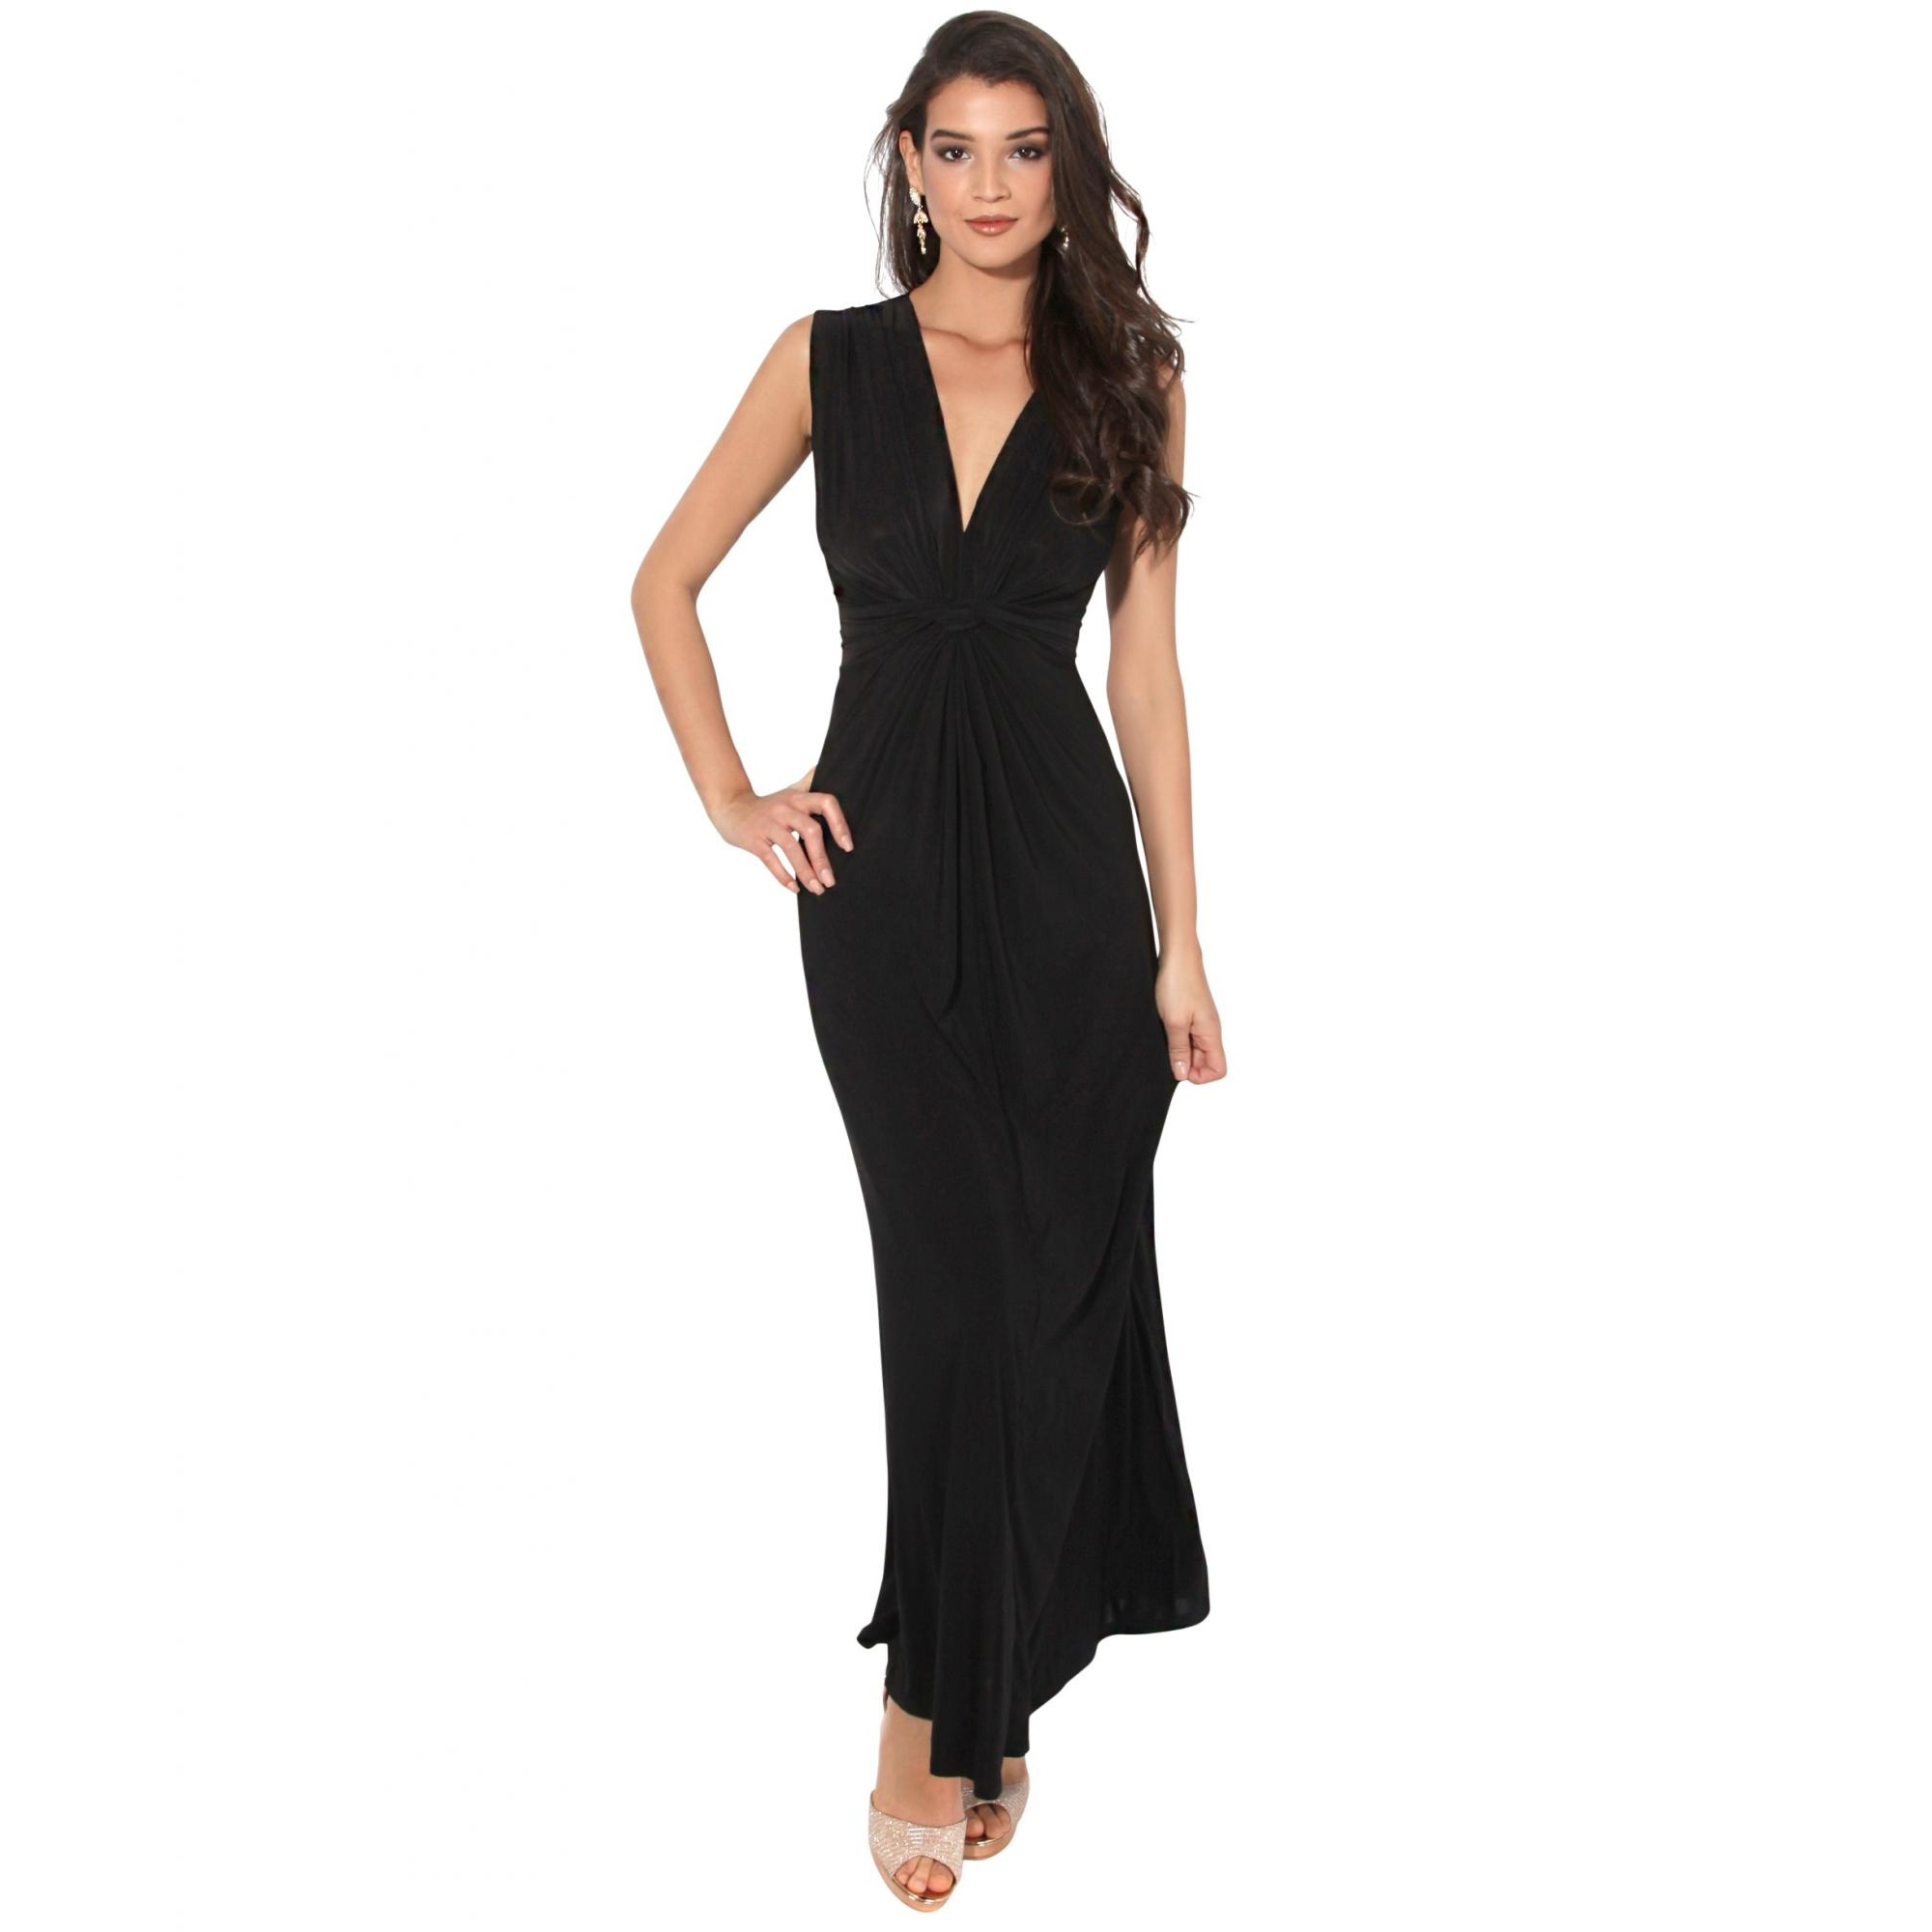 Krisp Womens/Ladies Knot Front Sleeveless Maxi Dress (16 UK) (Black)